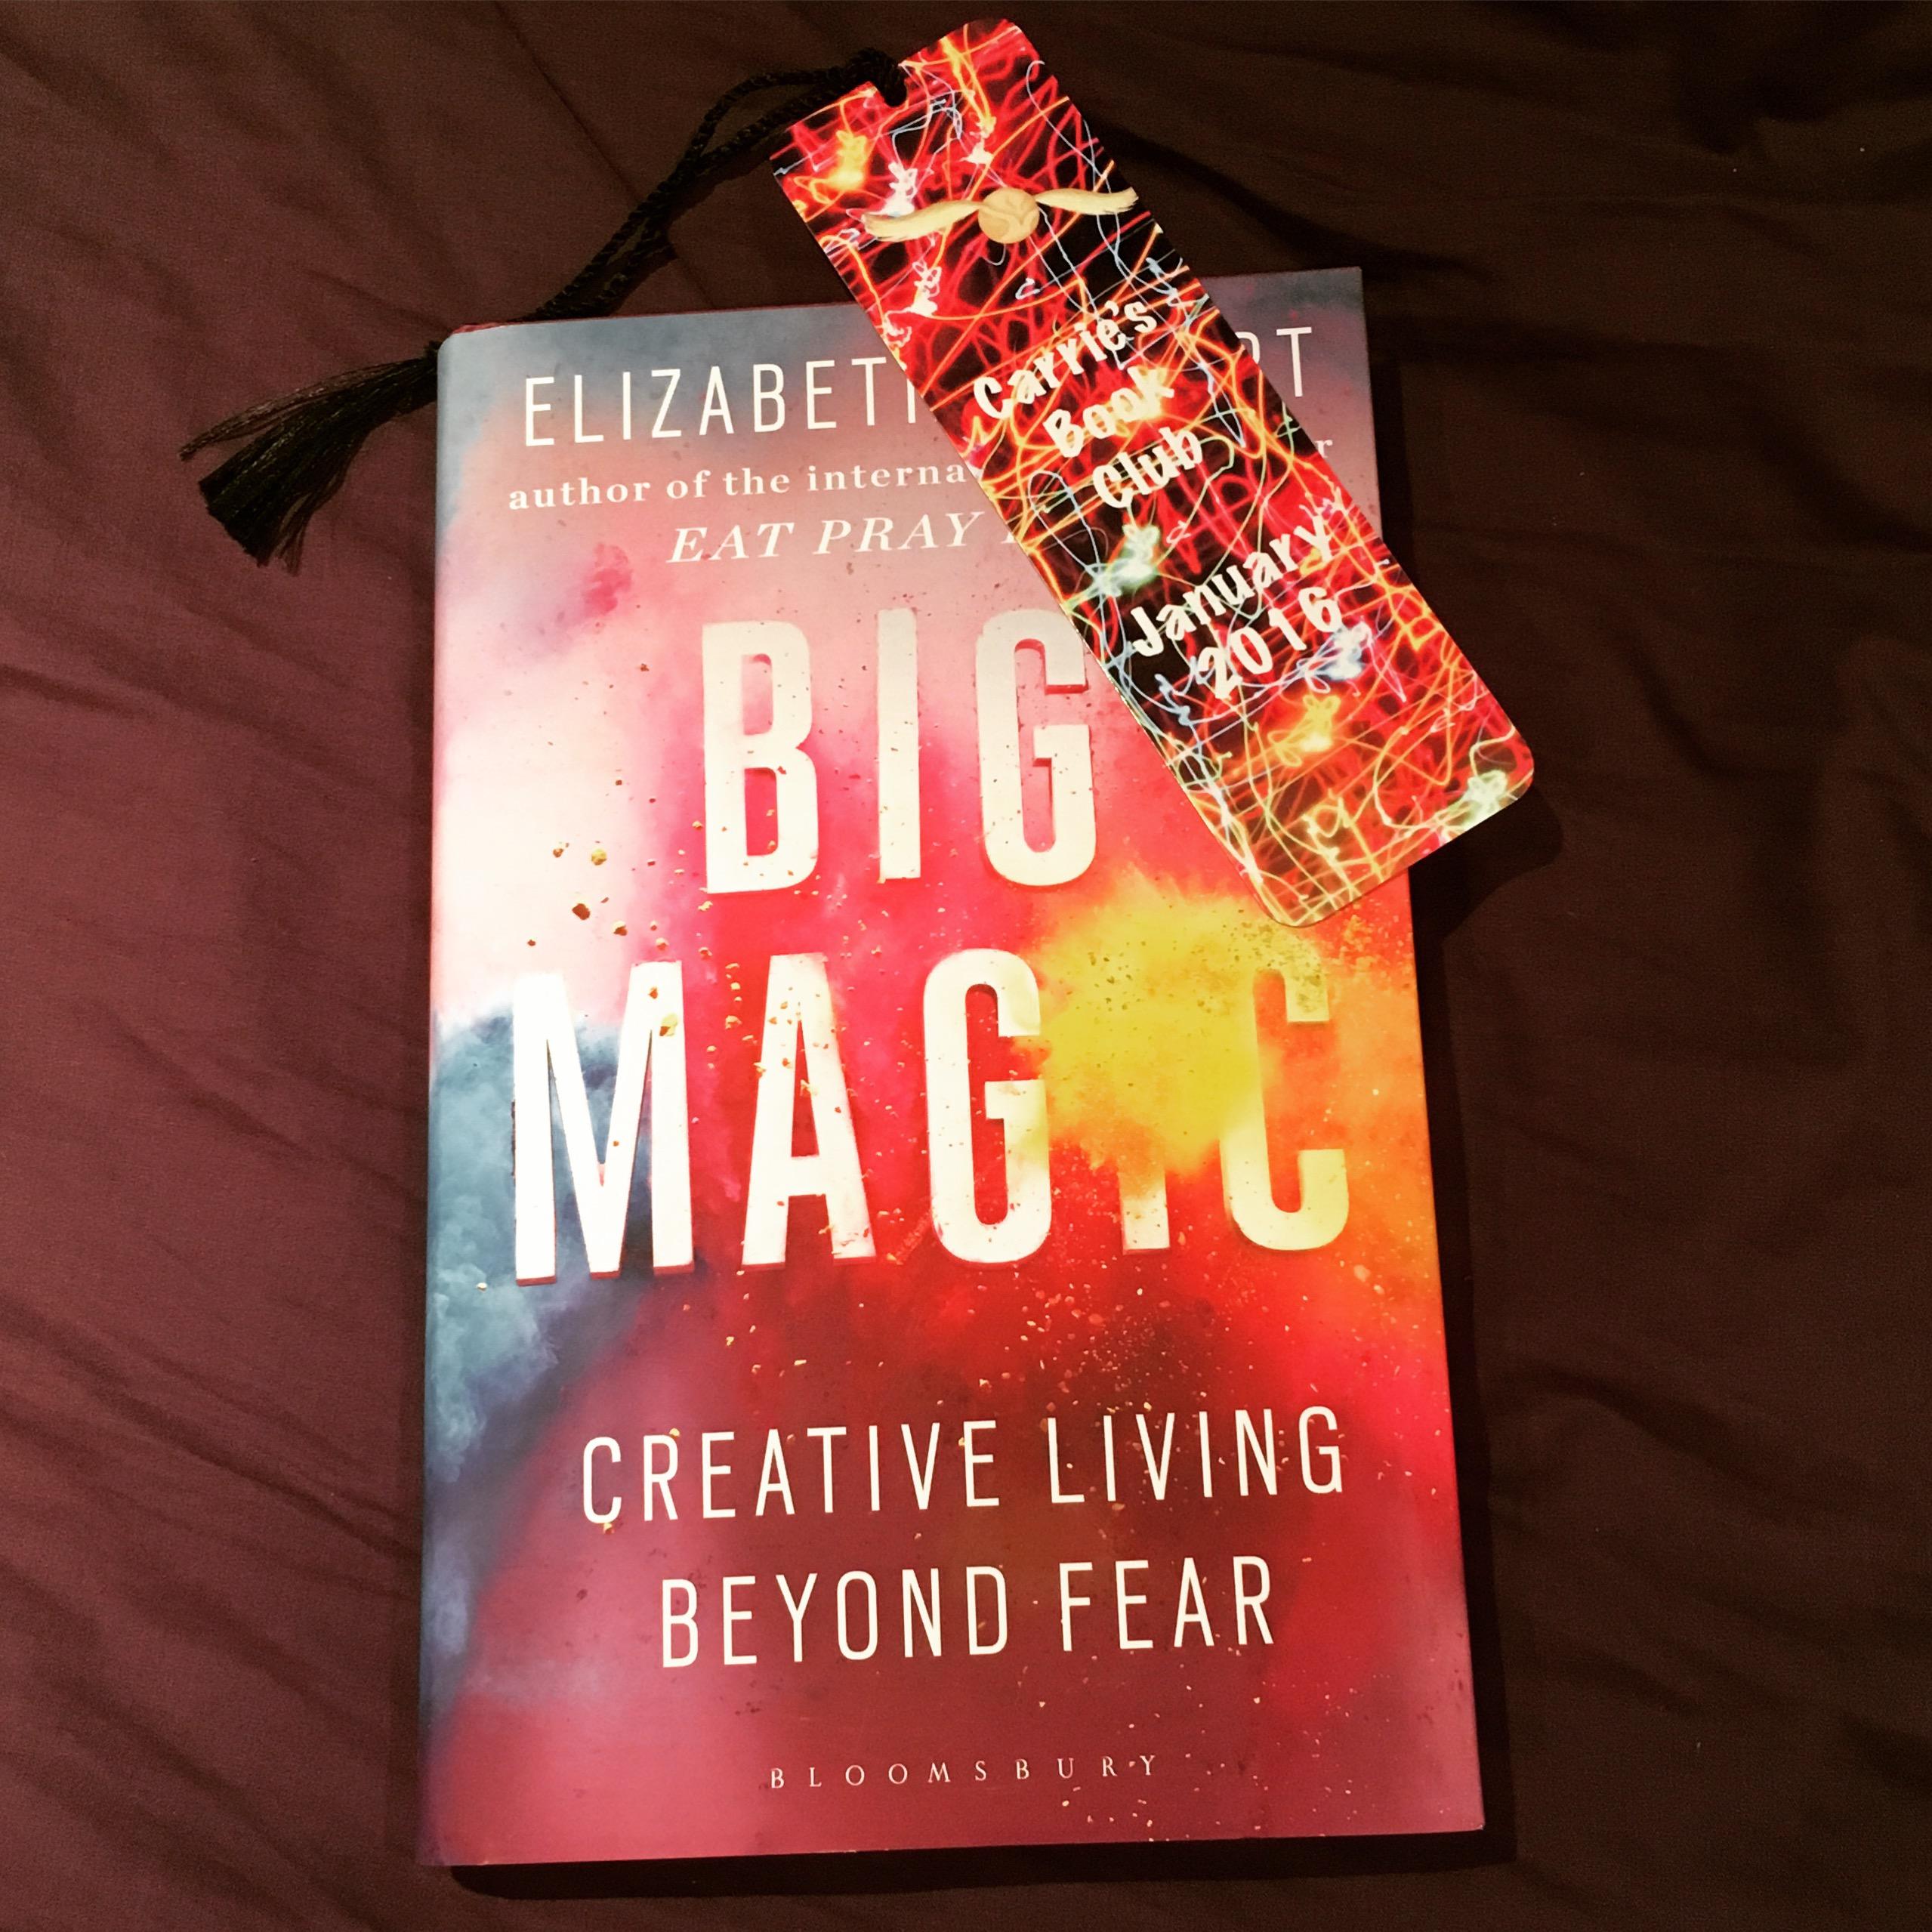 Big Magic, Creative Living Beyond Fear, Book 8, 2016 Reading Challenge